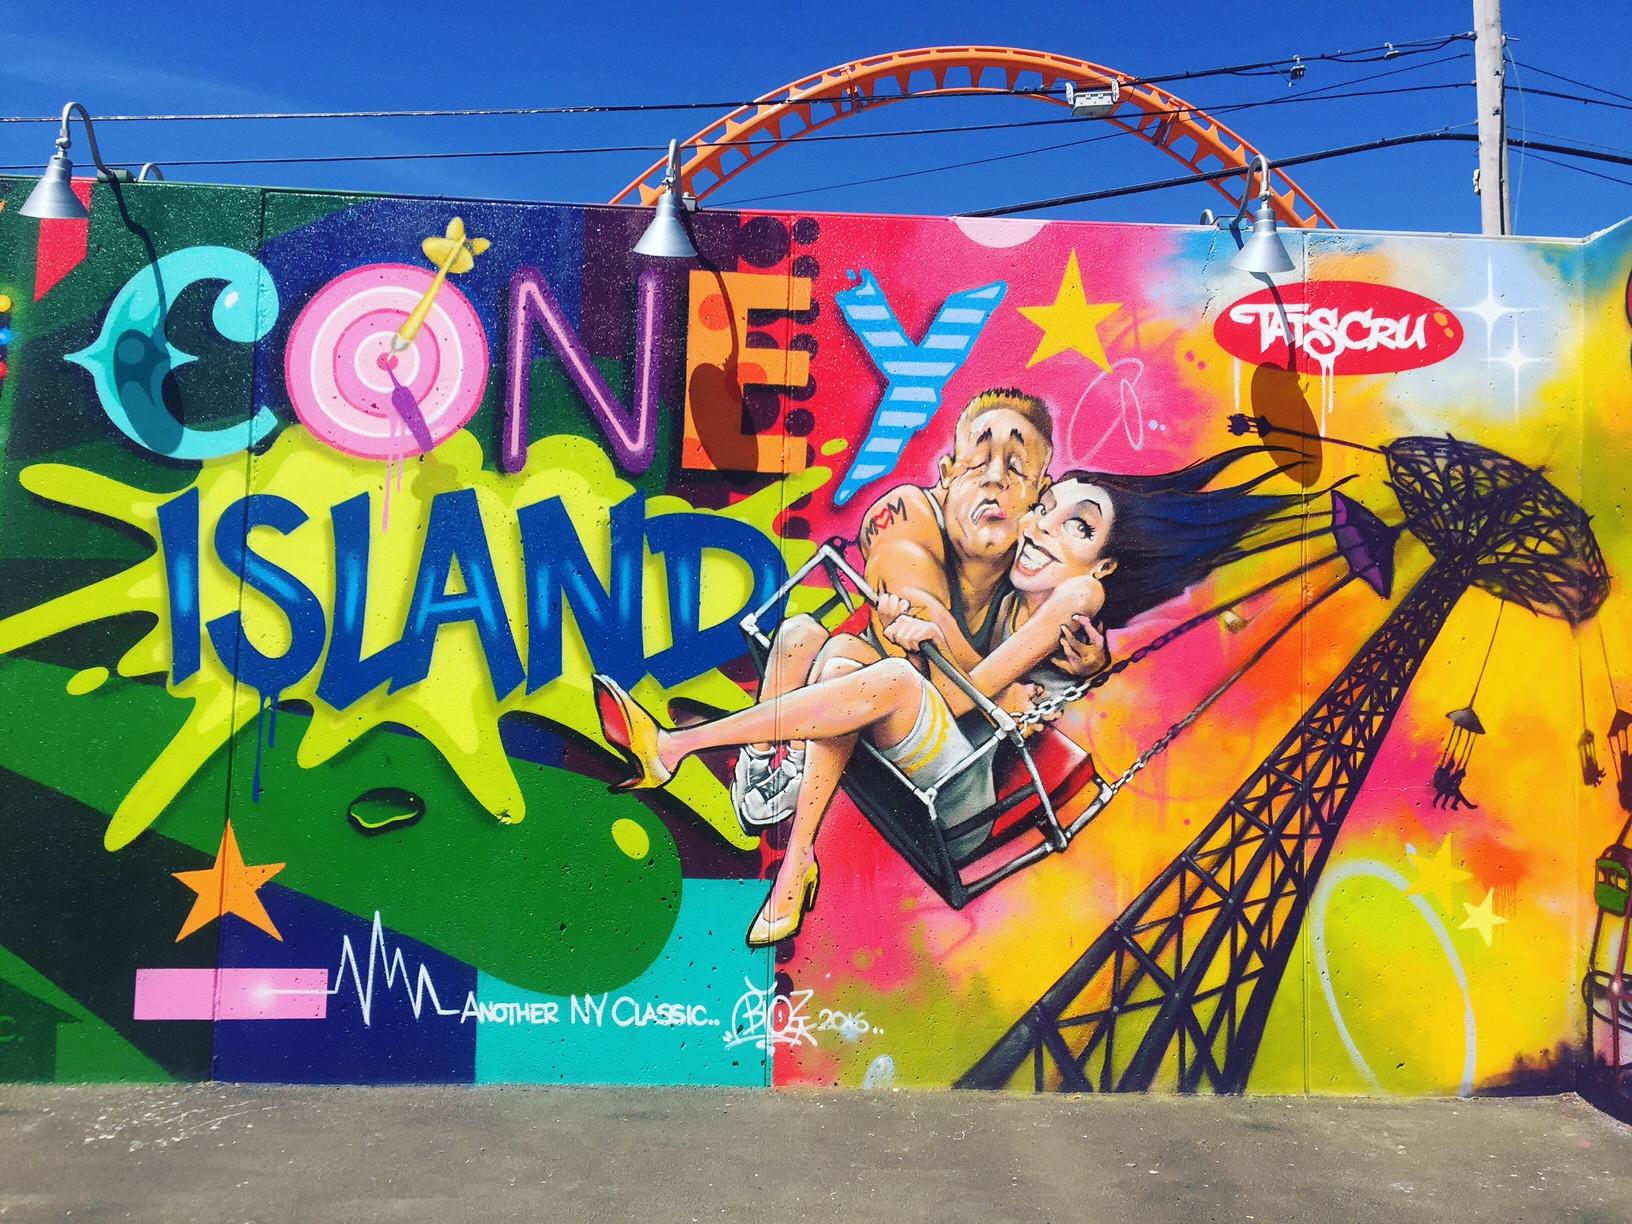 New mural by  Tats Cru  at  Coney Art Walls  in Coney Island, Brooklyn.